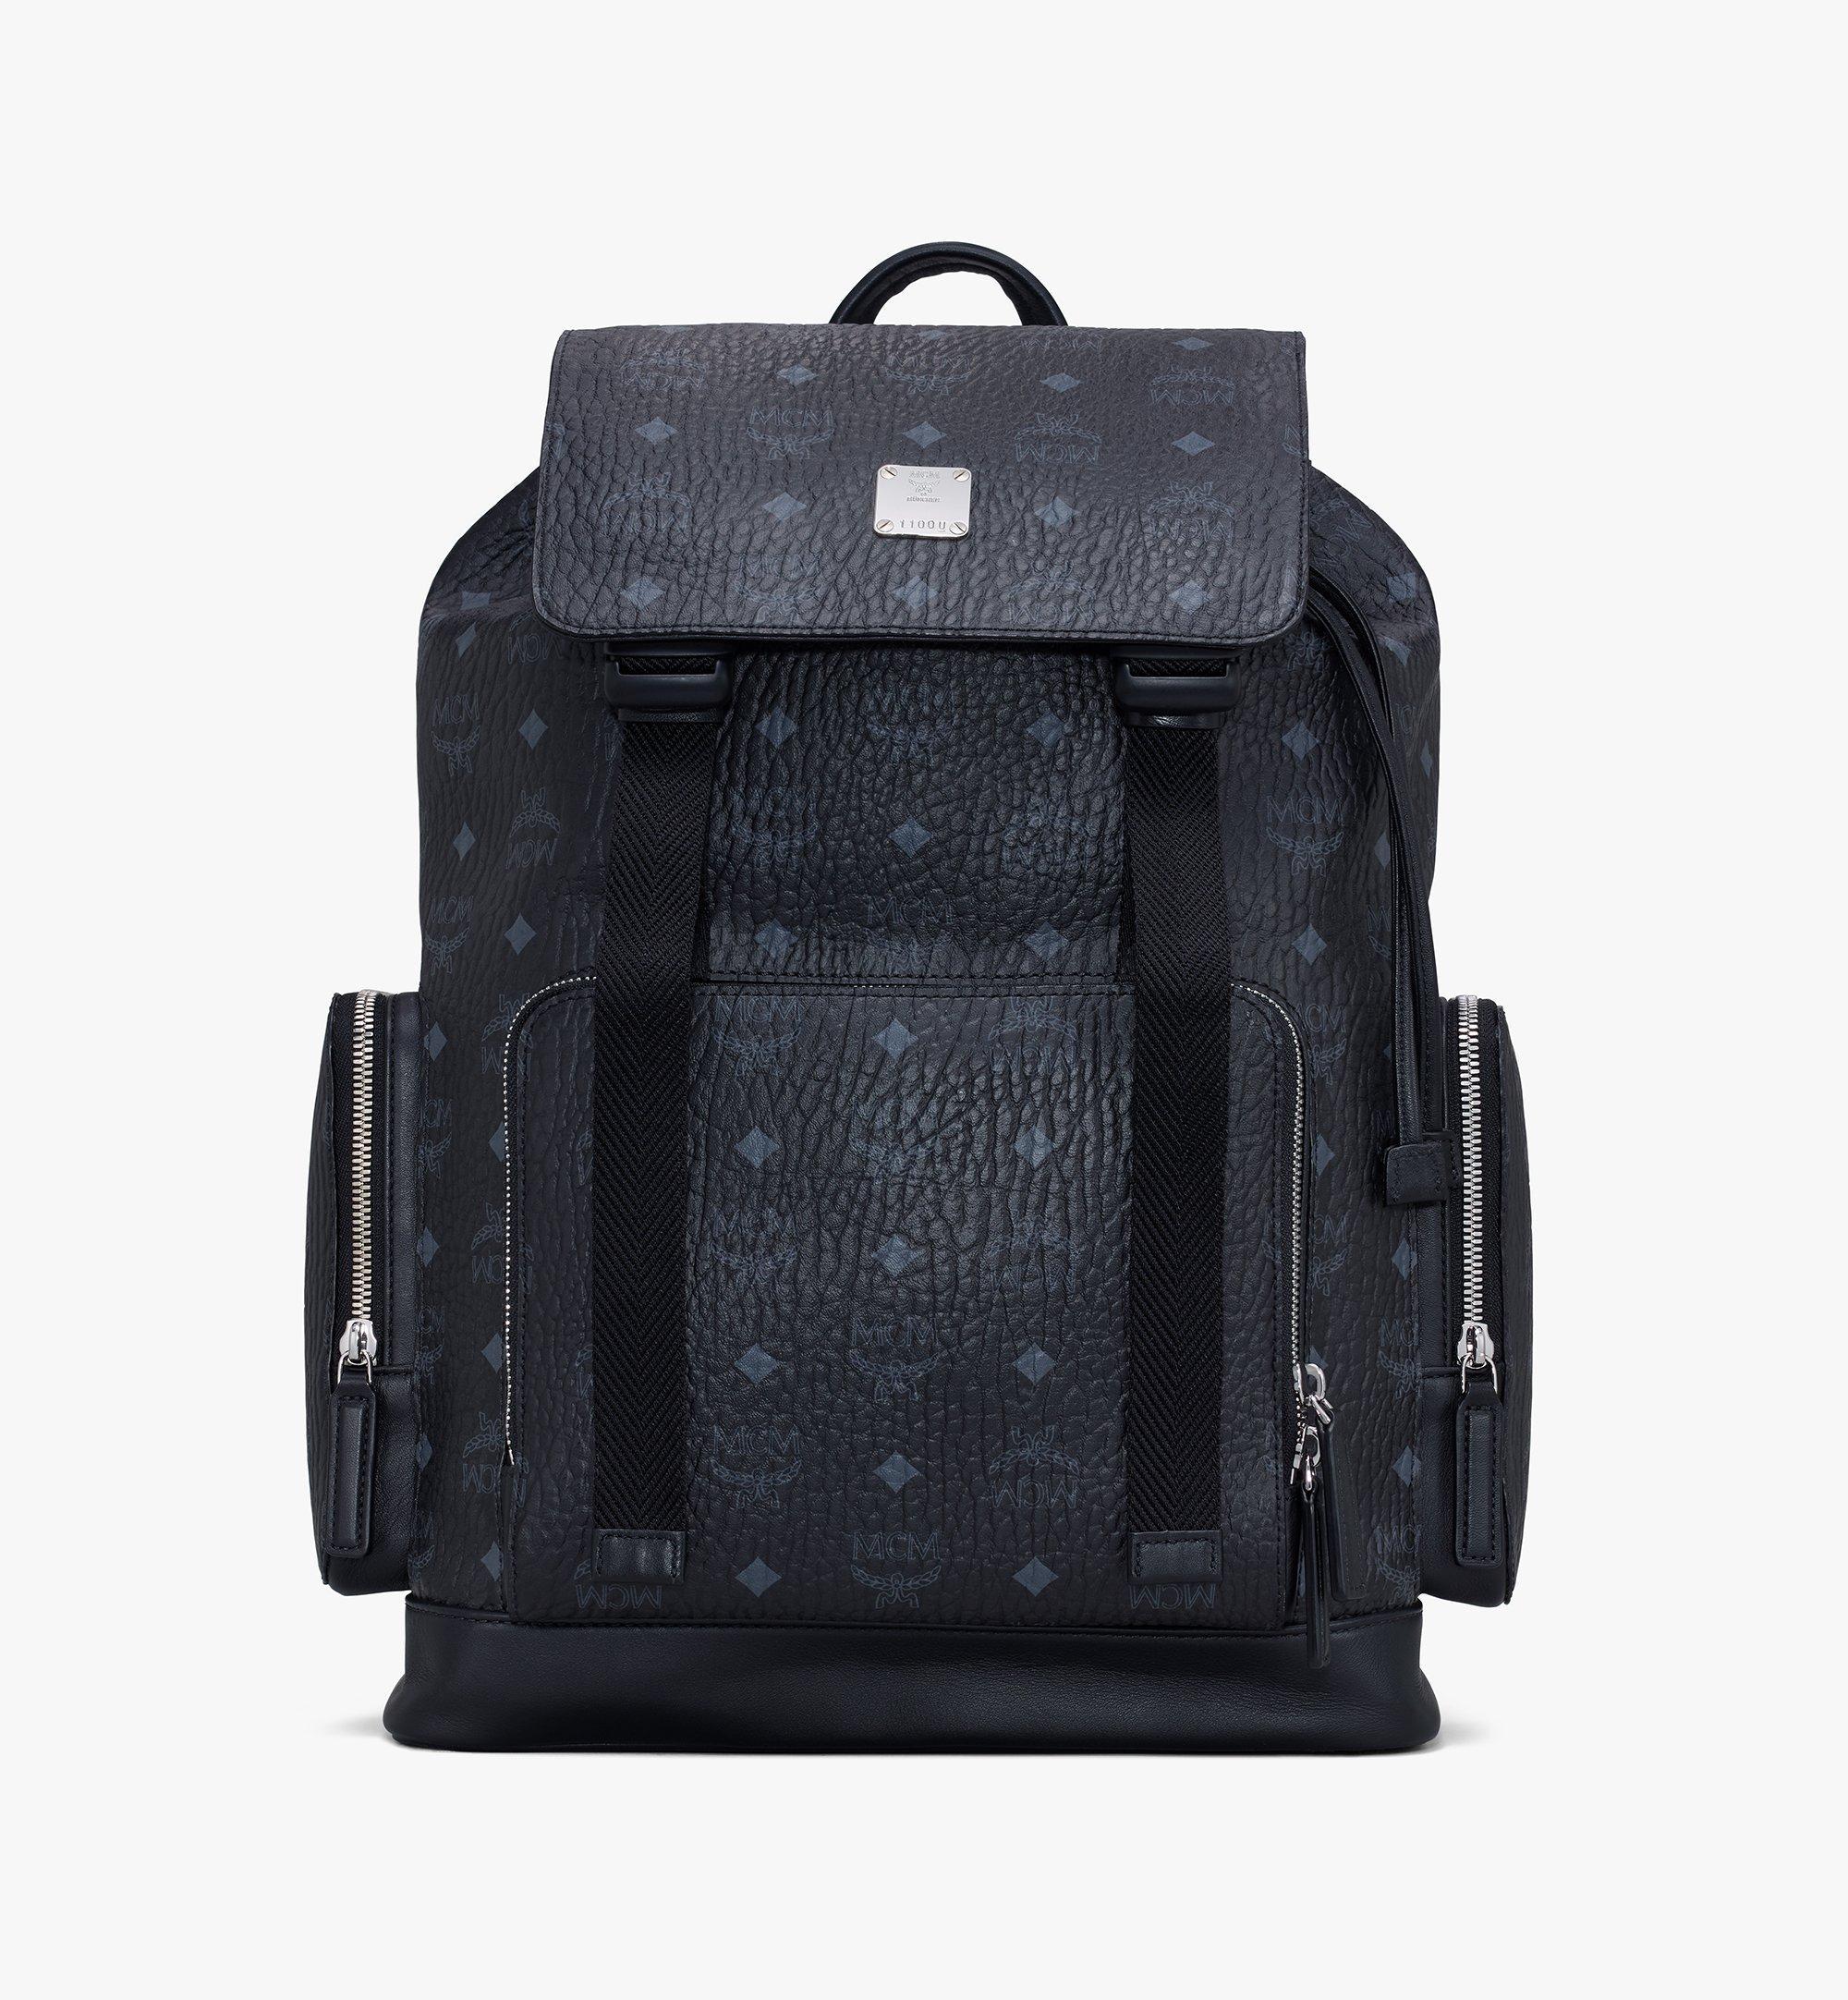 MCM Brandenburg Backpack in Visetos Black MMKASBG03BK001 Alternate View 1